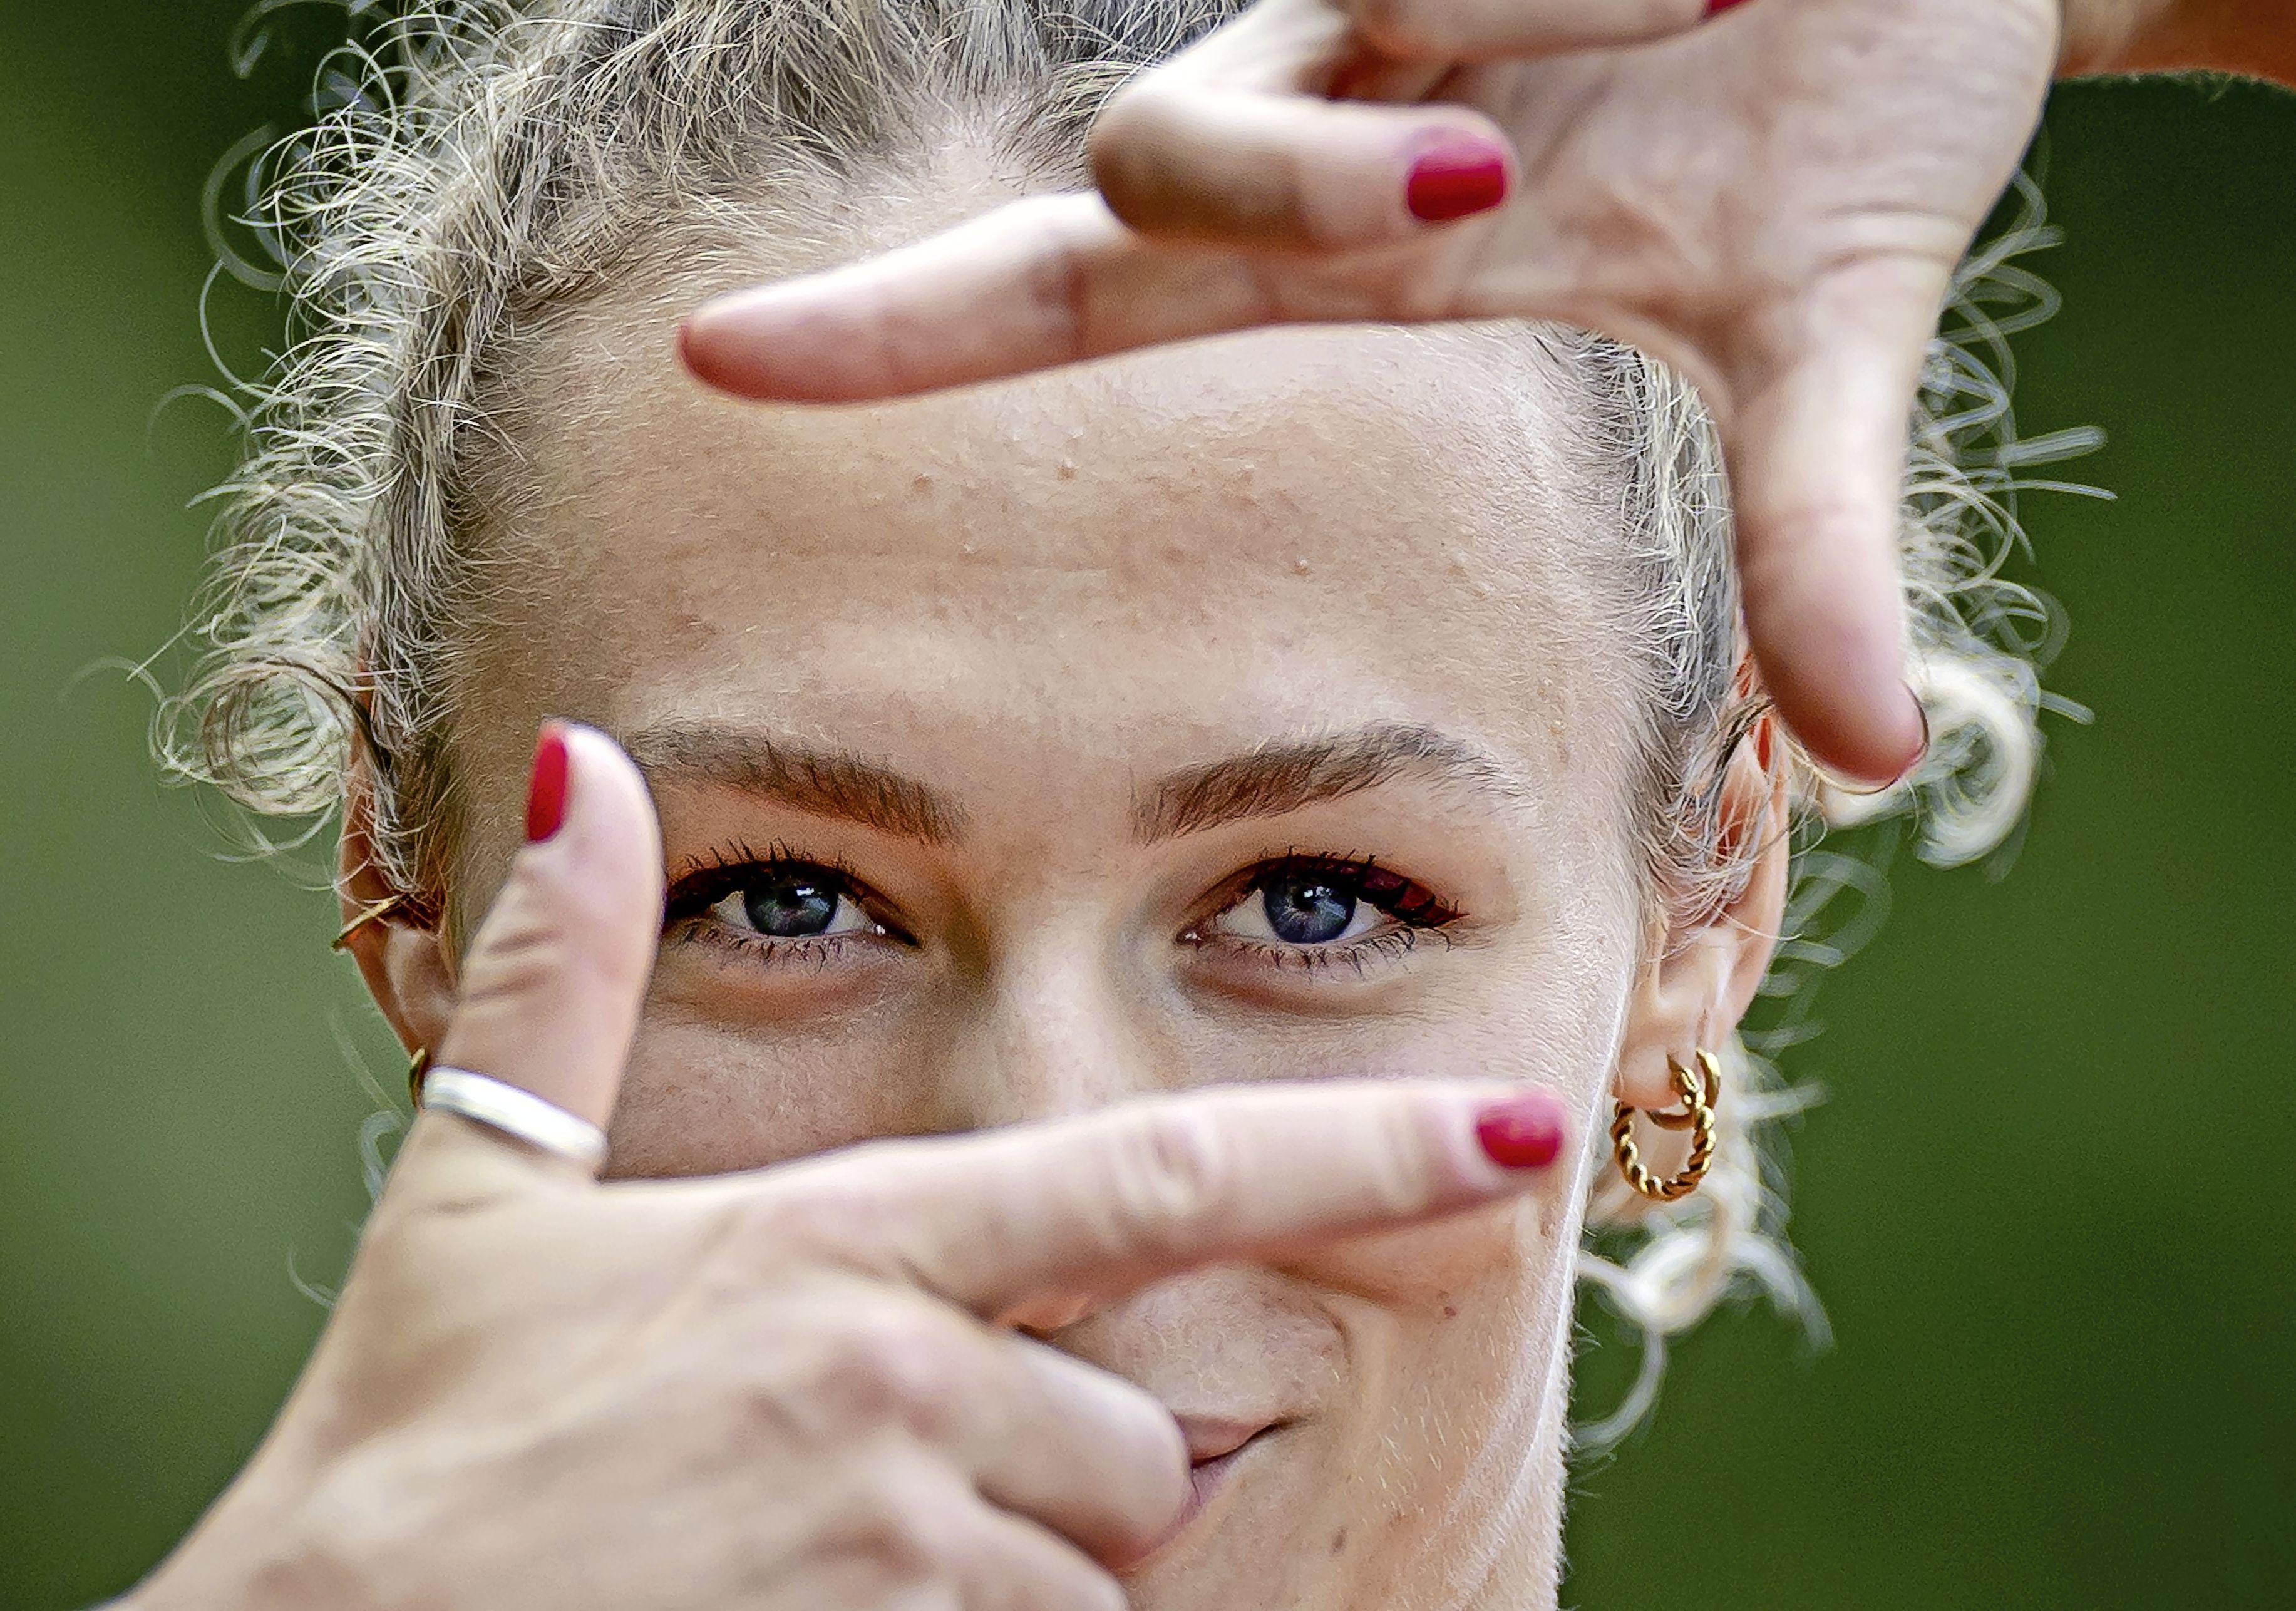 Atlete Lieke Klaver: 'Als ik er verzorgd uitzie, voel ik me lekker fris, fruitig en sterk'